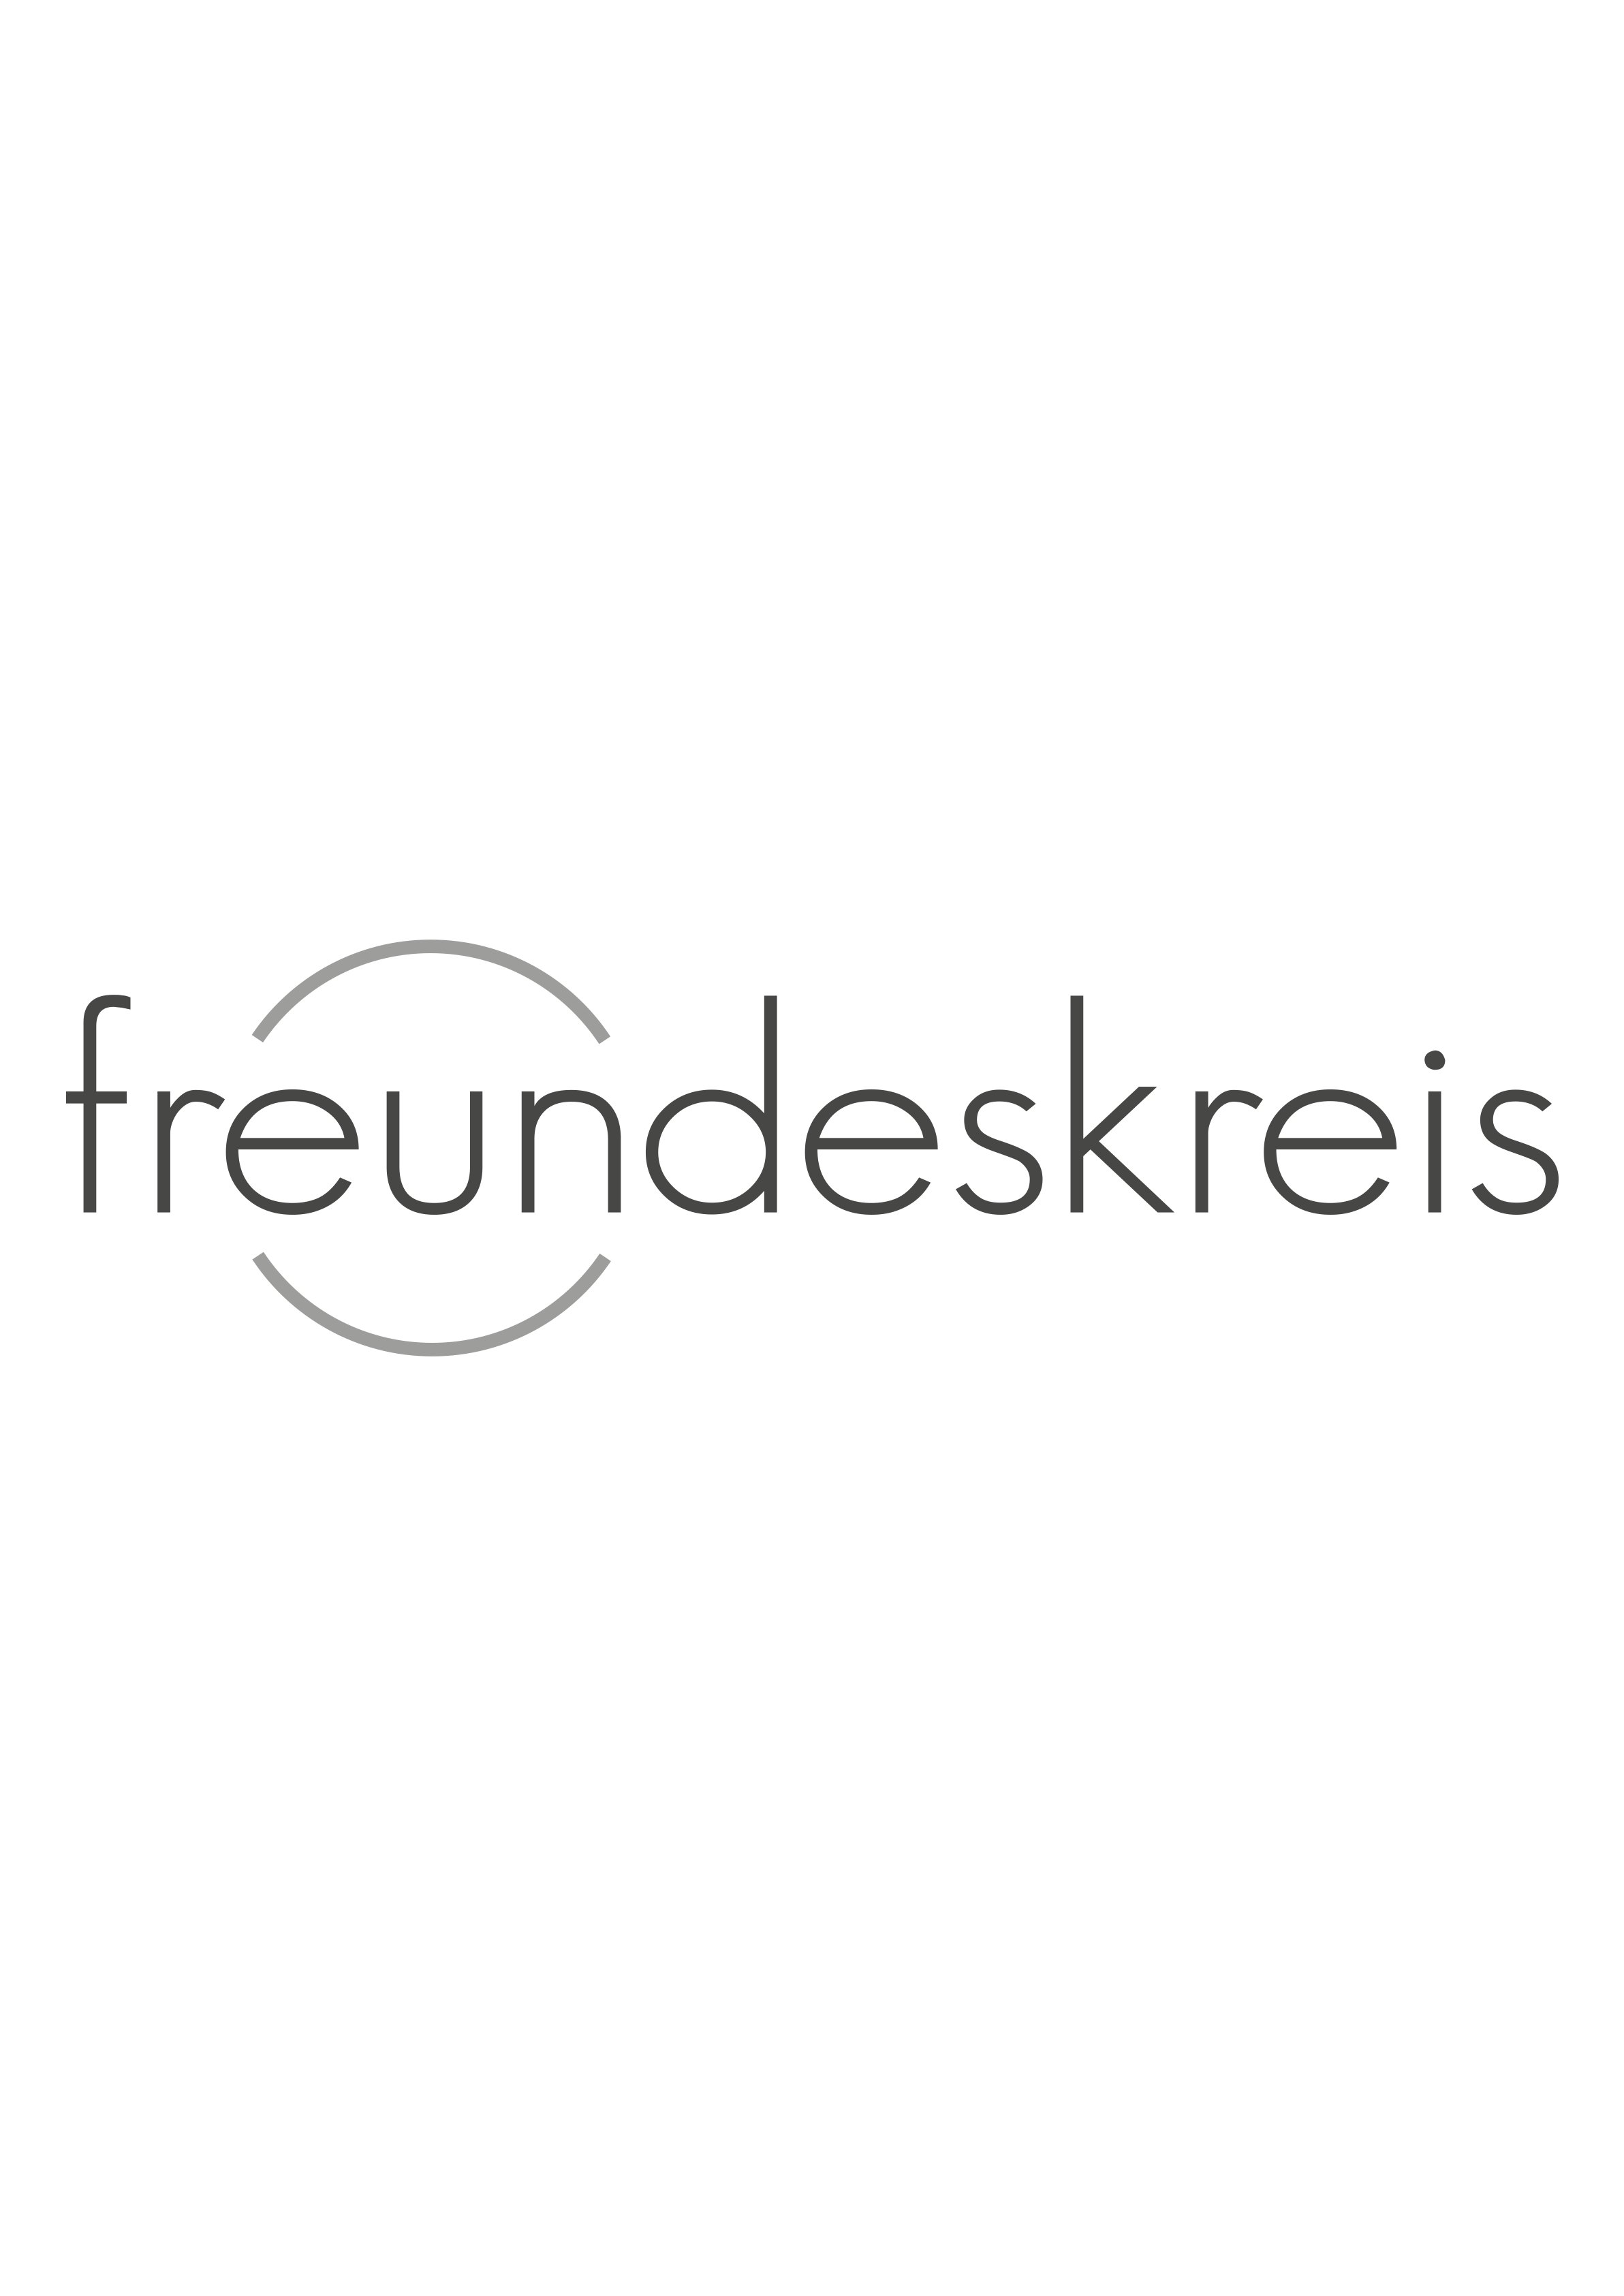 freundeskreis_logo